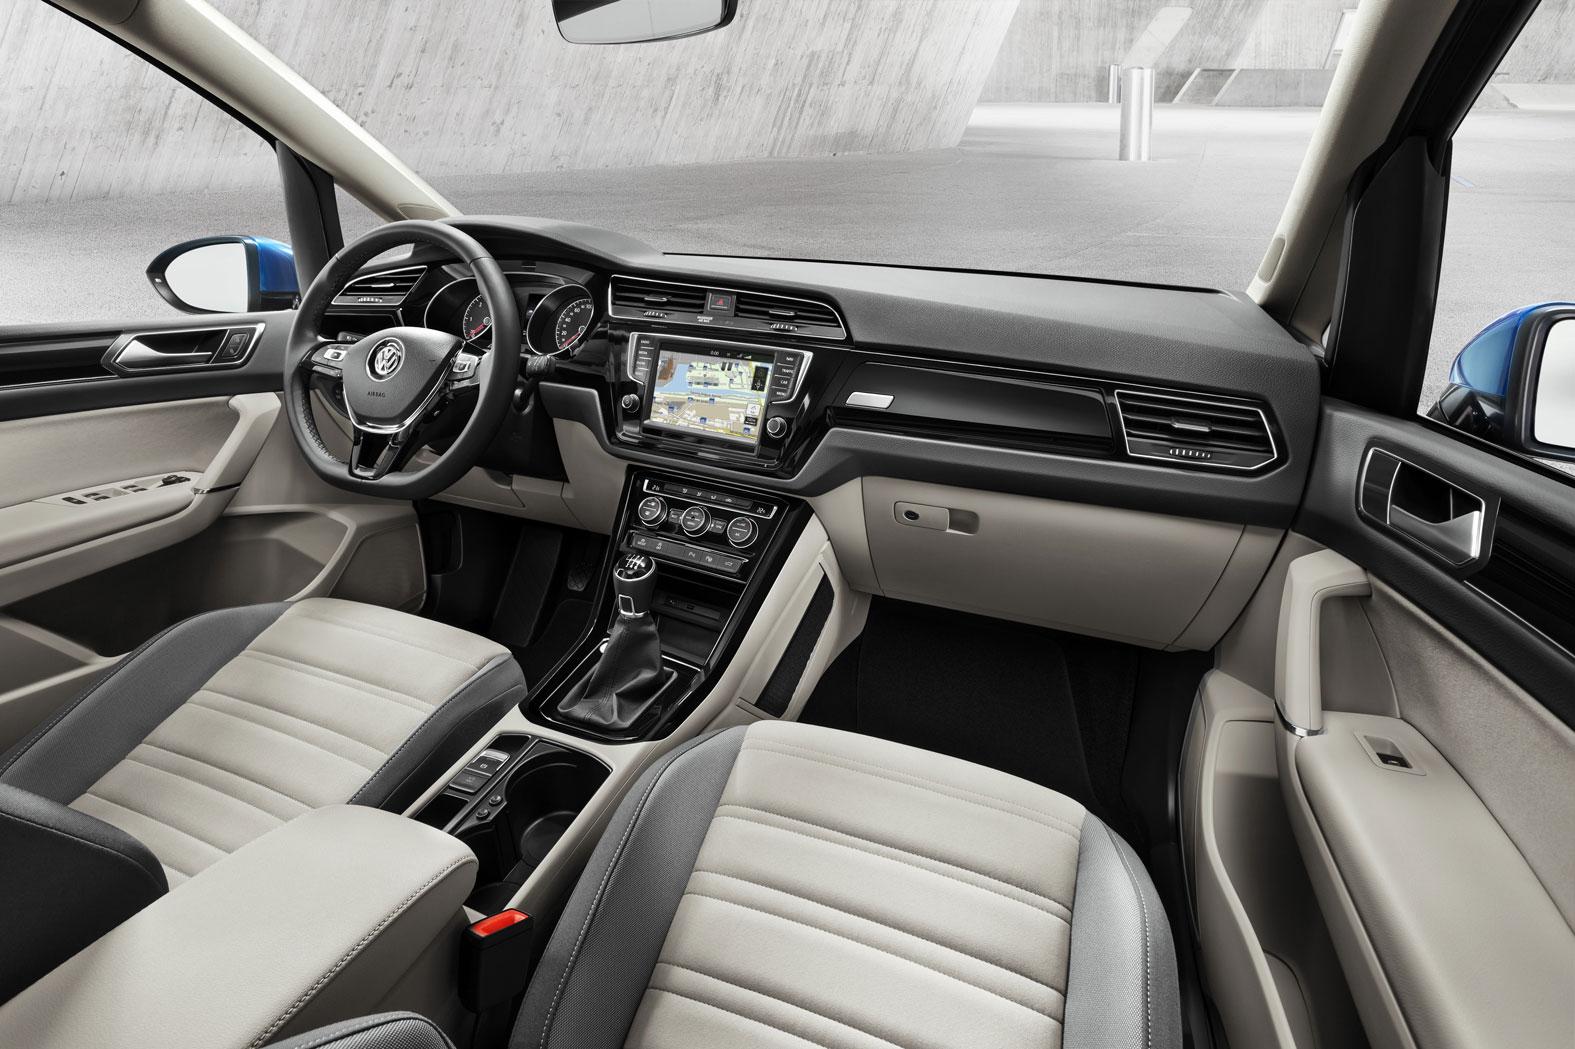 Foto Interiores Volkswagen Touran Monovolumen 2015